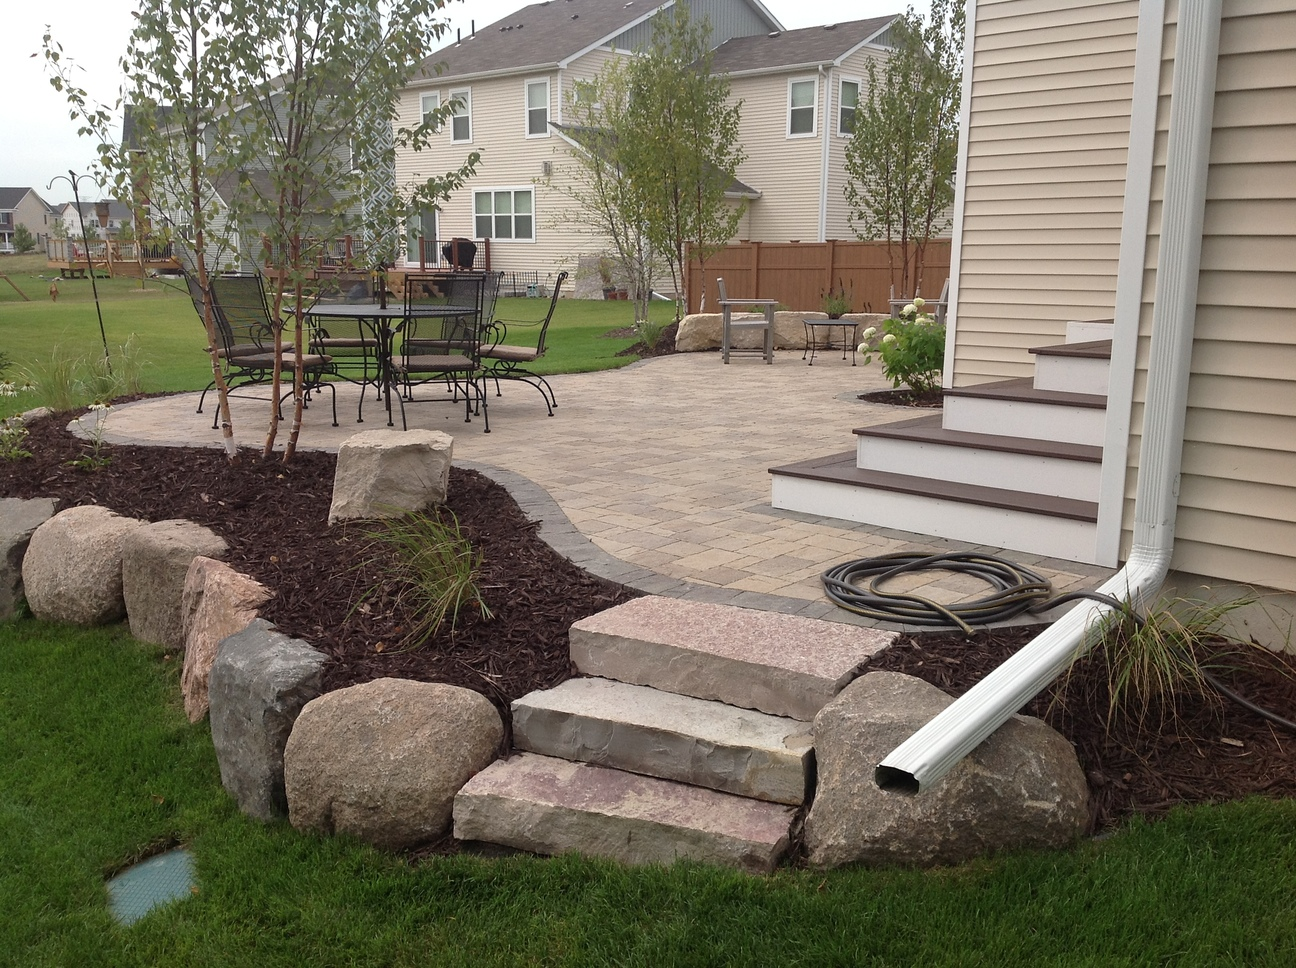 GroundWrx | Landscape & Hardscape Design: Maple Grove, MN on Hardscape Patio id=41857